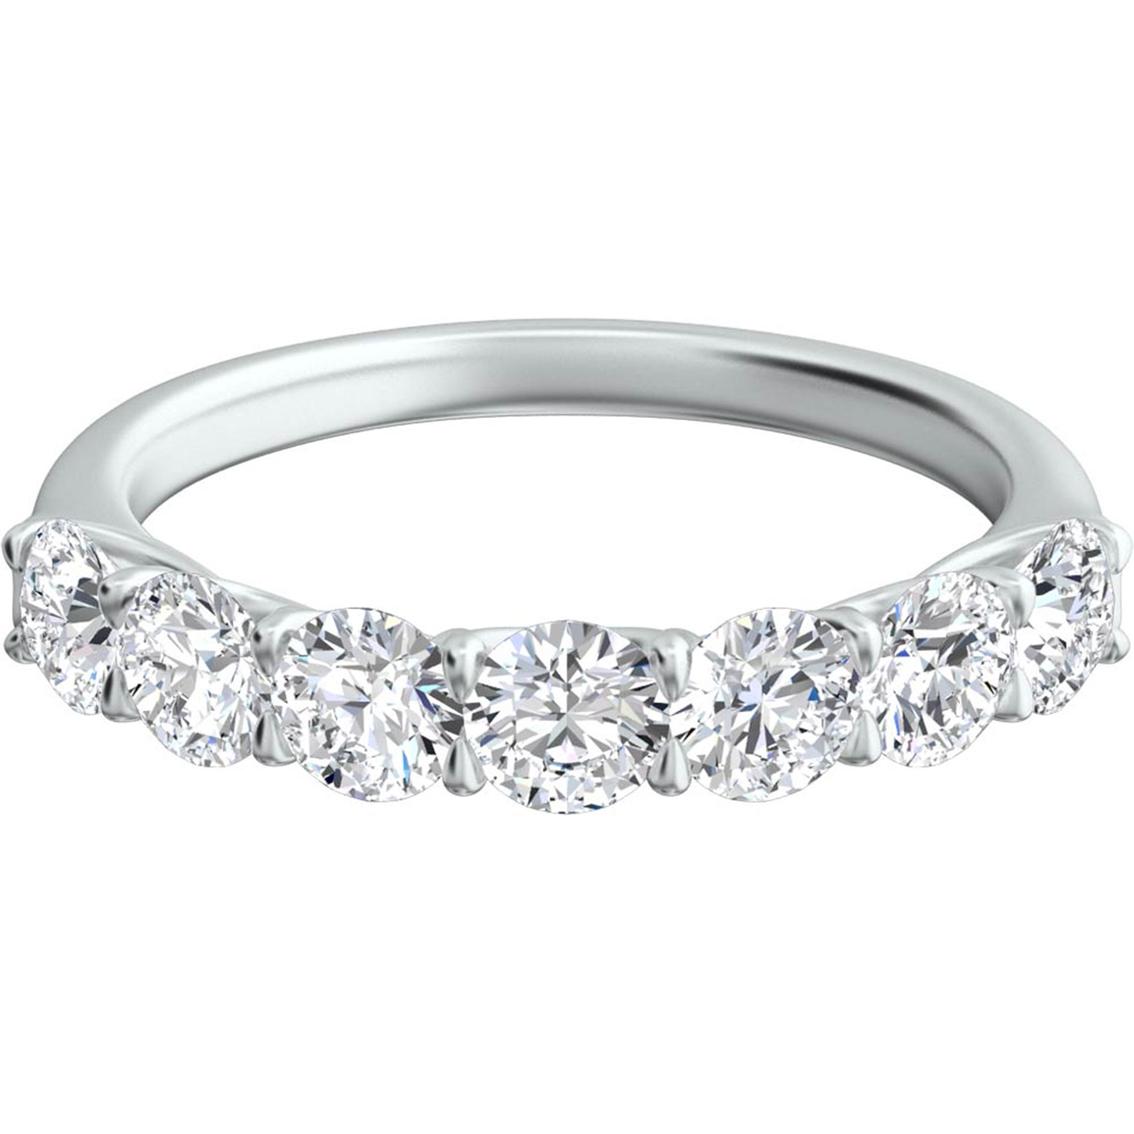 Sasha Primak Platinum 1 Ctw 7 Stone Trellis Diamond Wedding Band